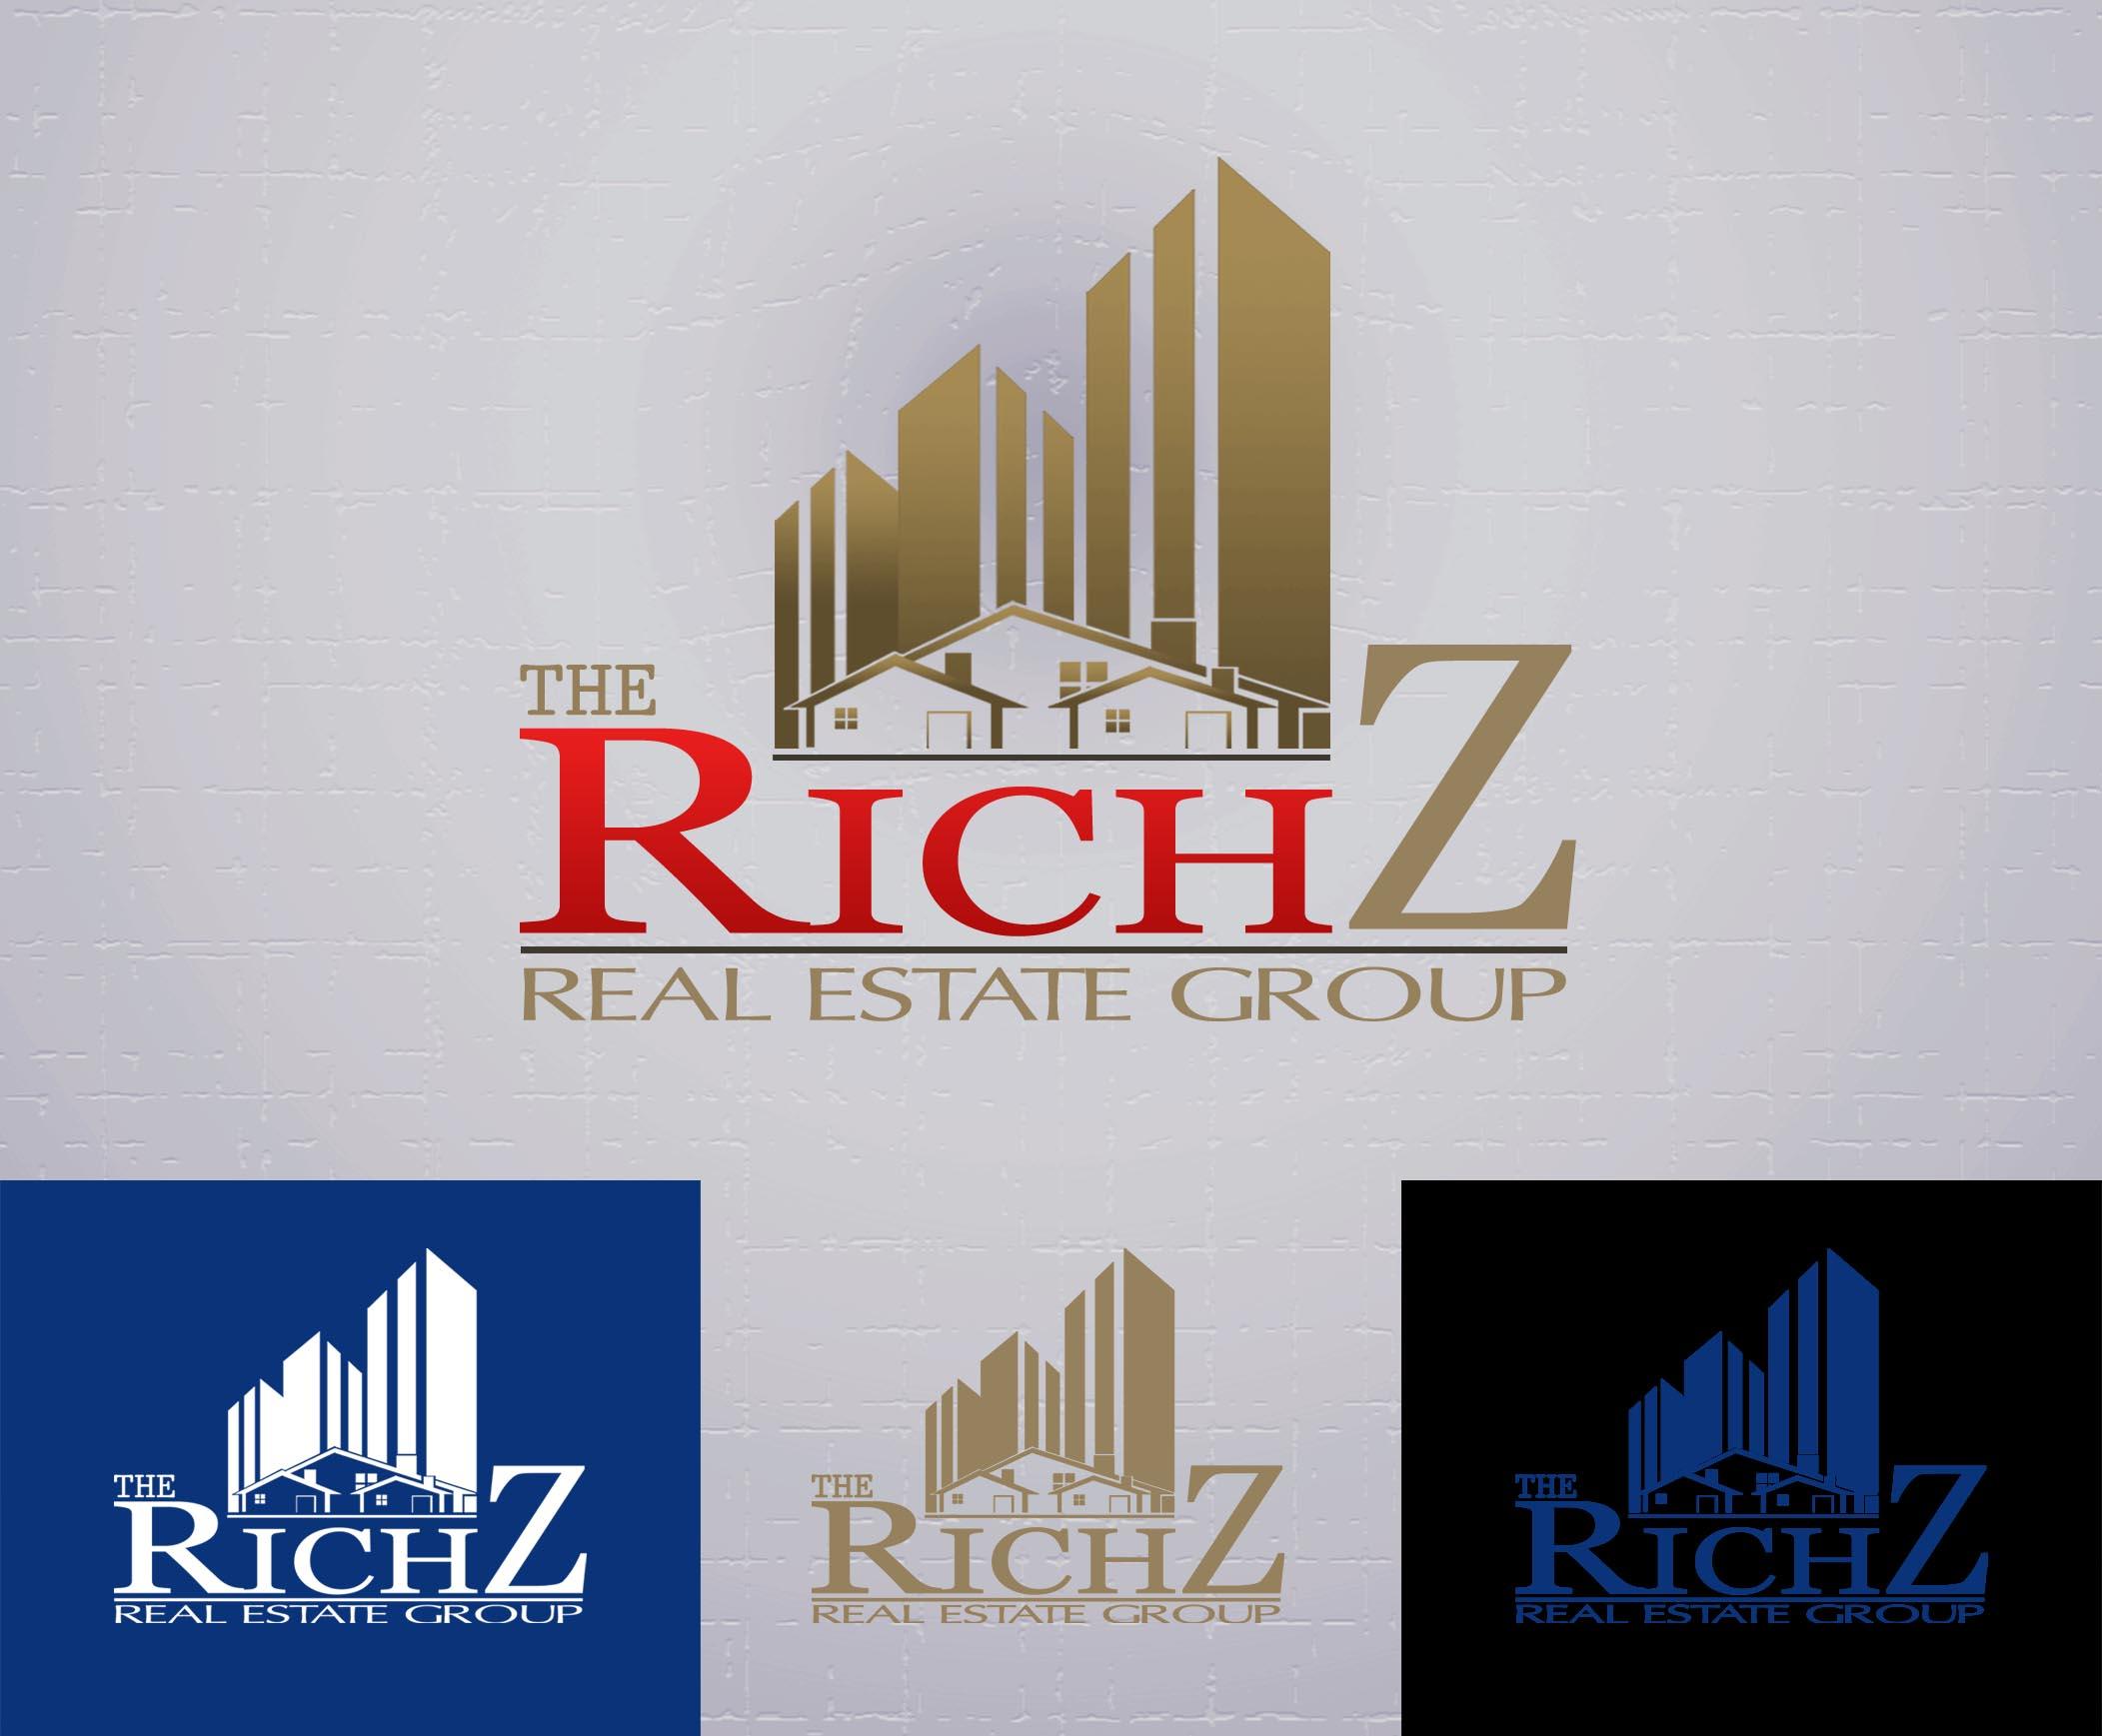 Logo Design by Cesar III Sotto - Entry No. 318 in the Logo Design Contest The Rich Z. Real Estate Group Logo Design.